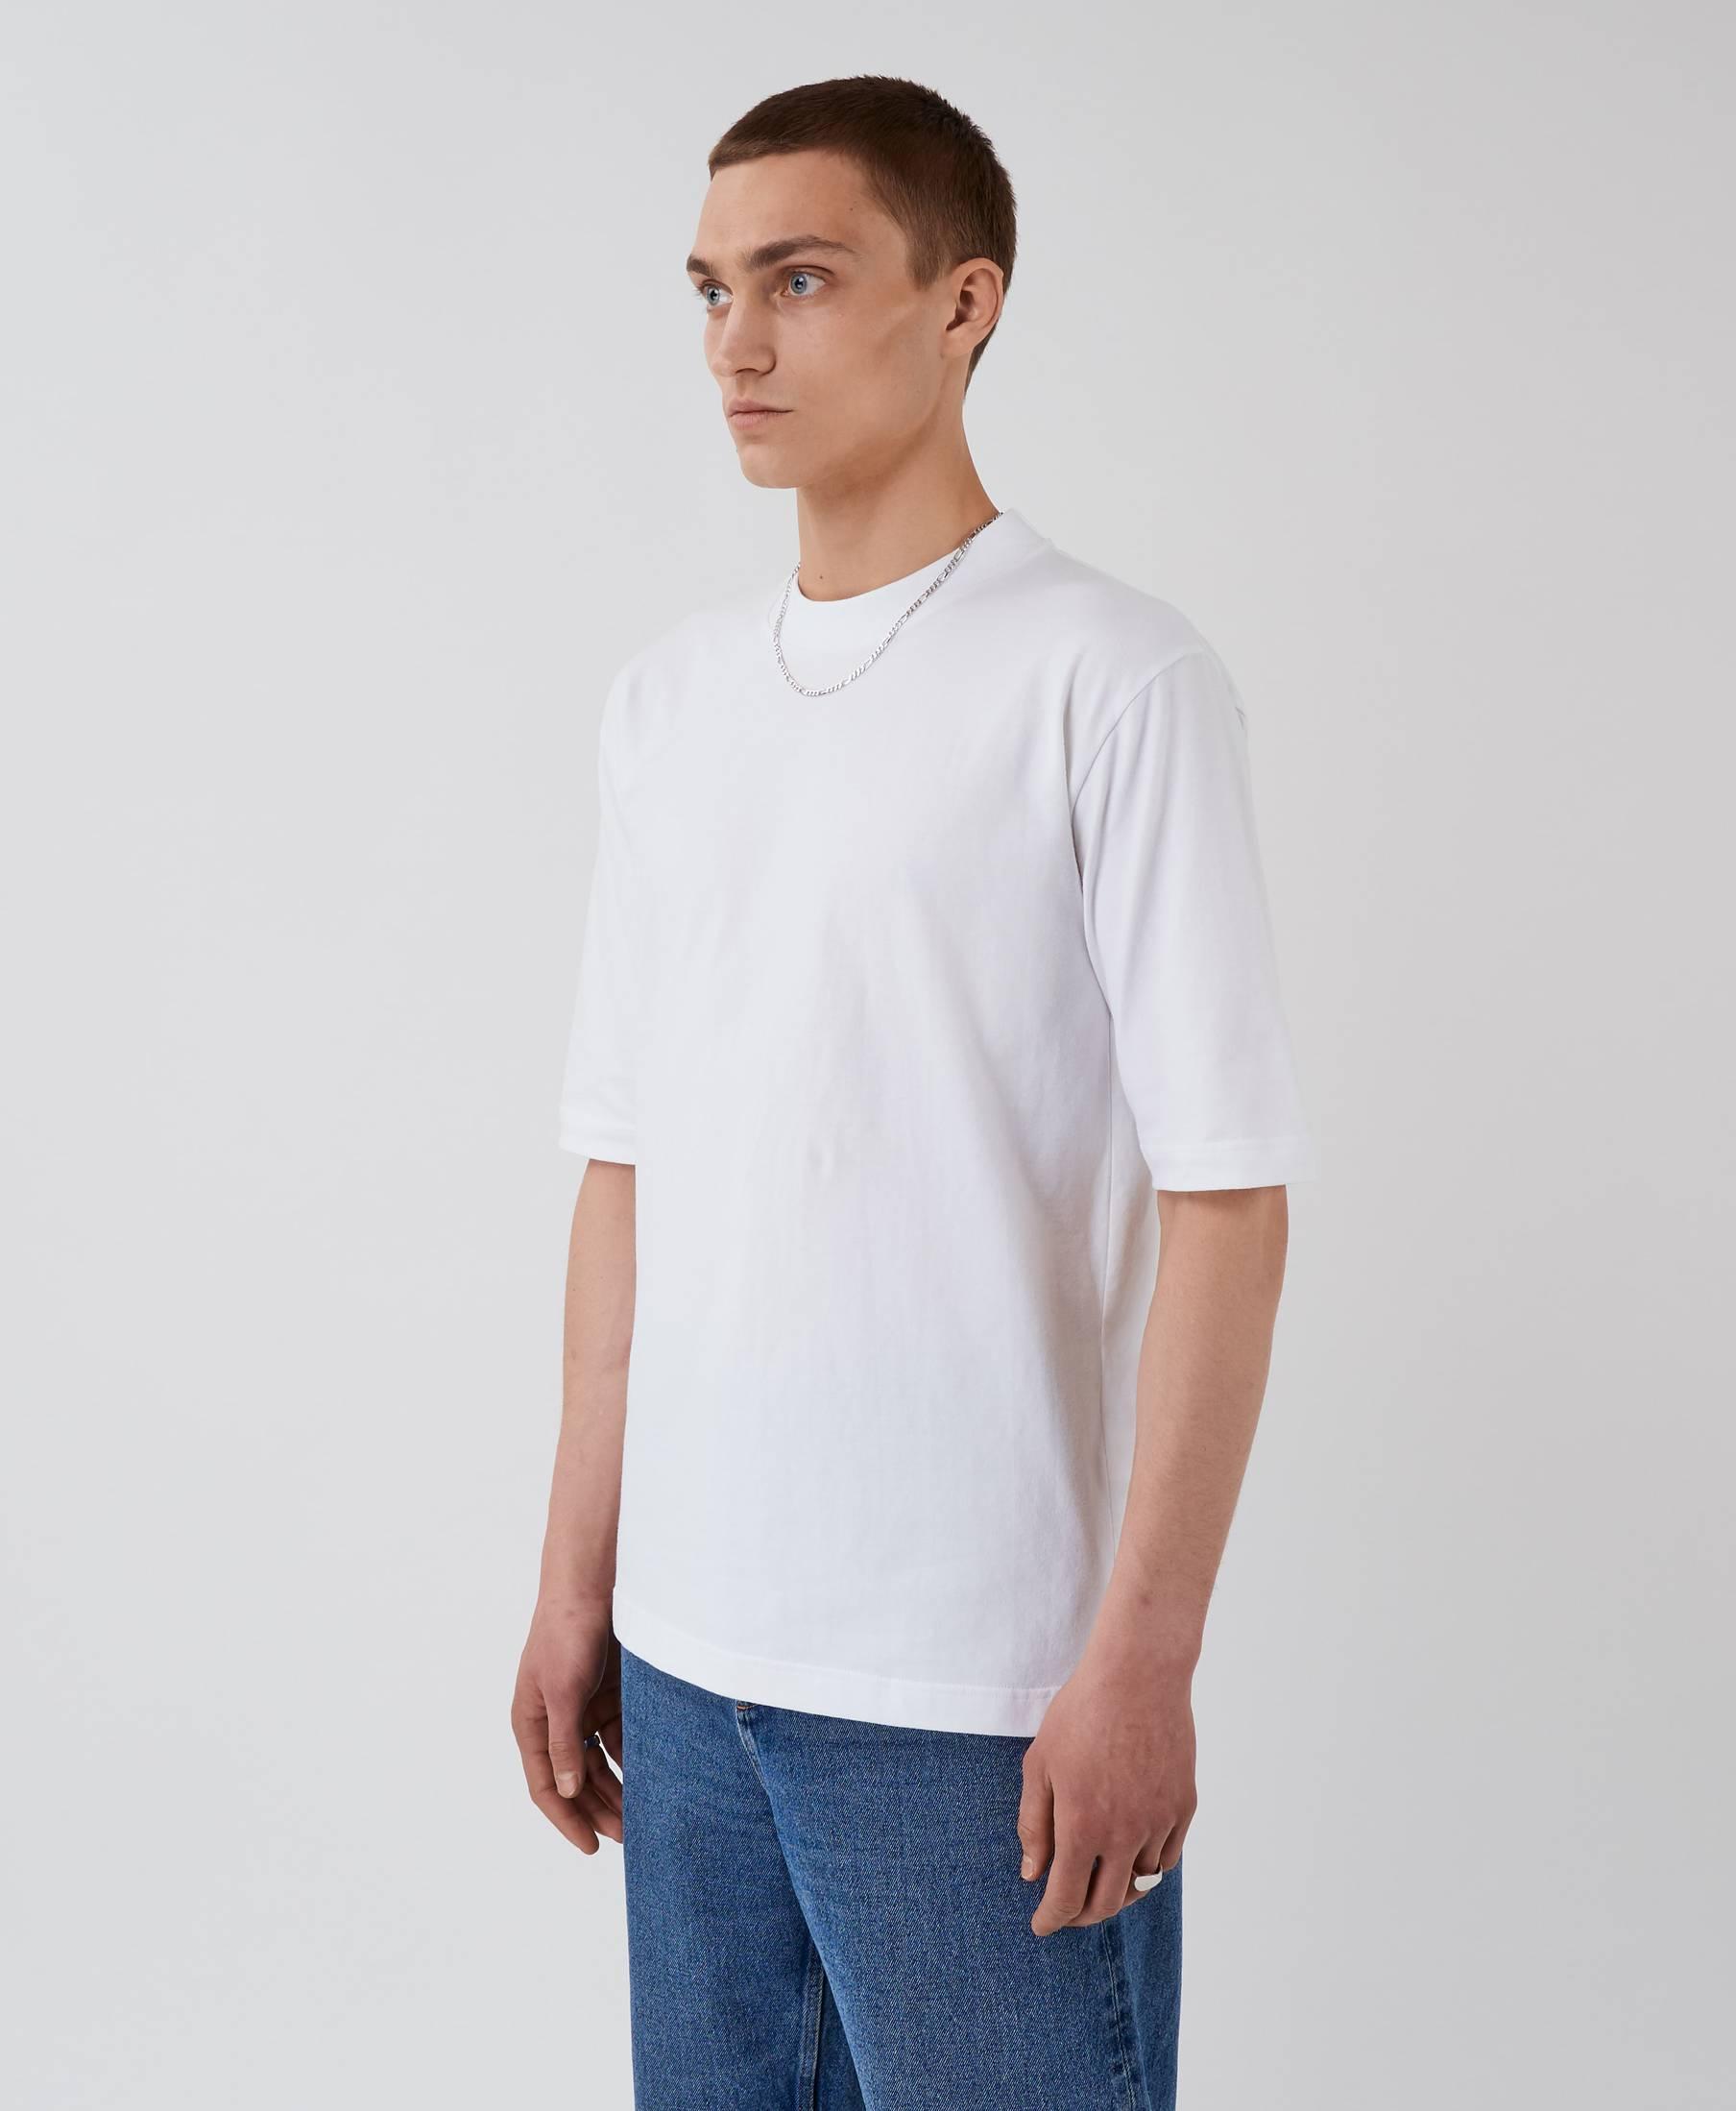 Comfy Tee Virgin White